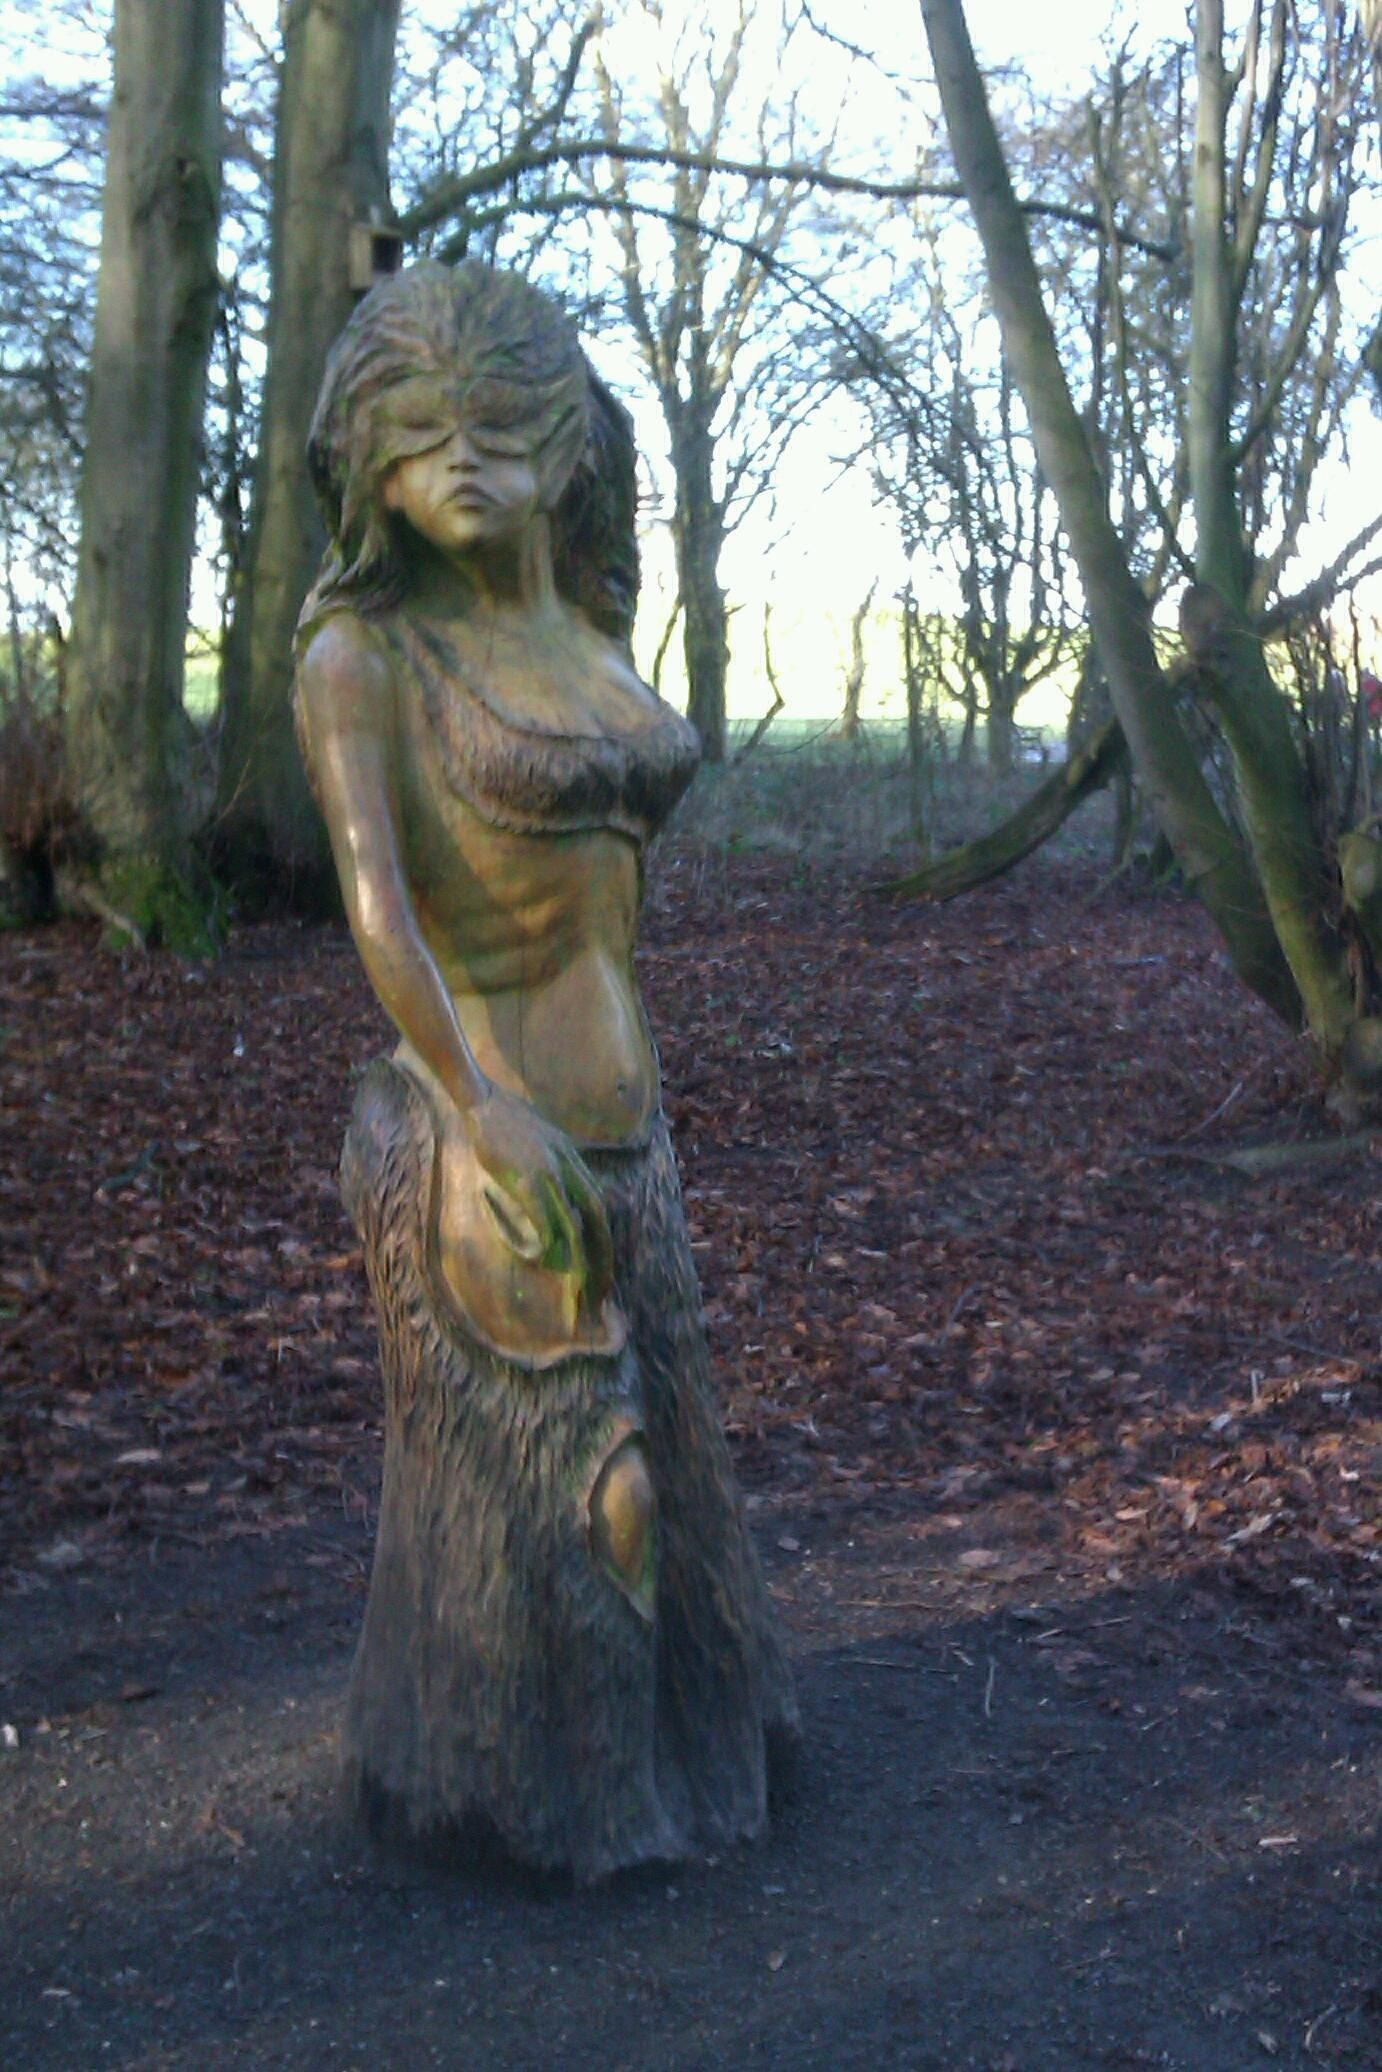 Wooden sculpture at Hardwick Hall, Durham, England